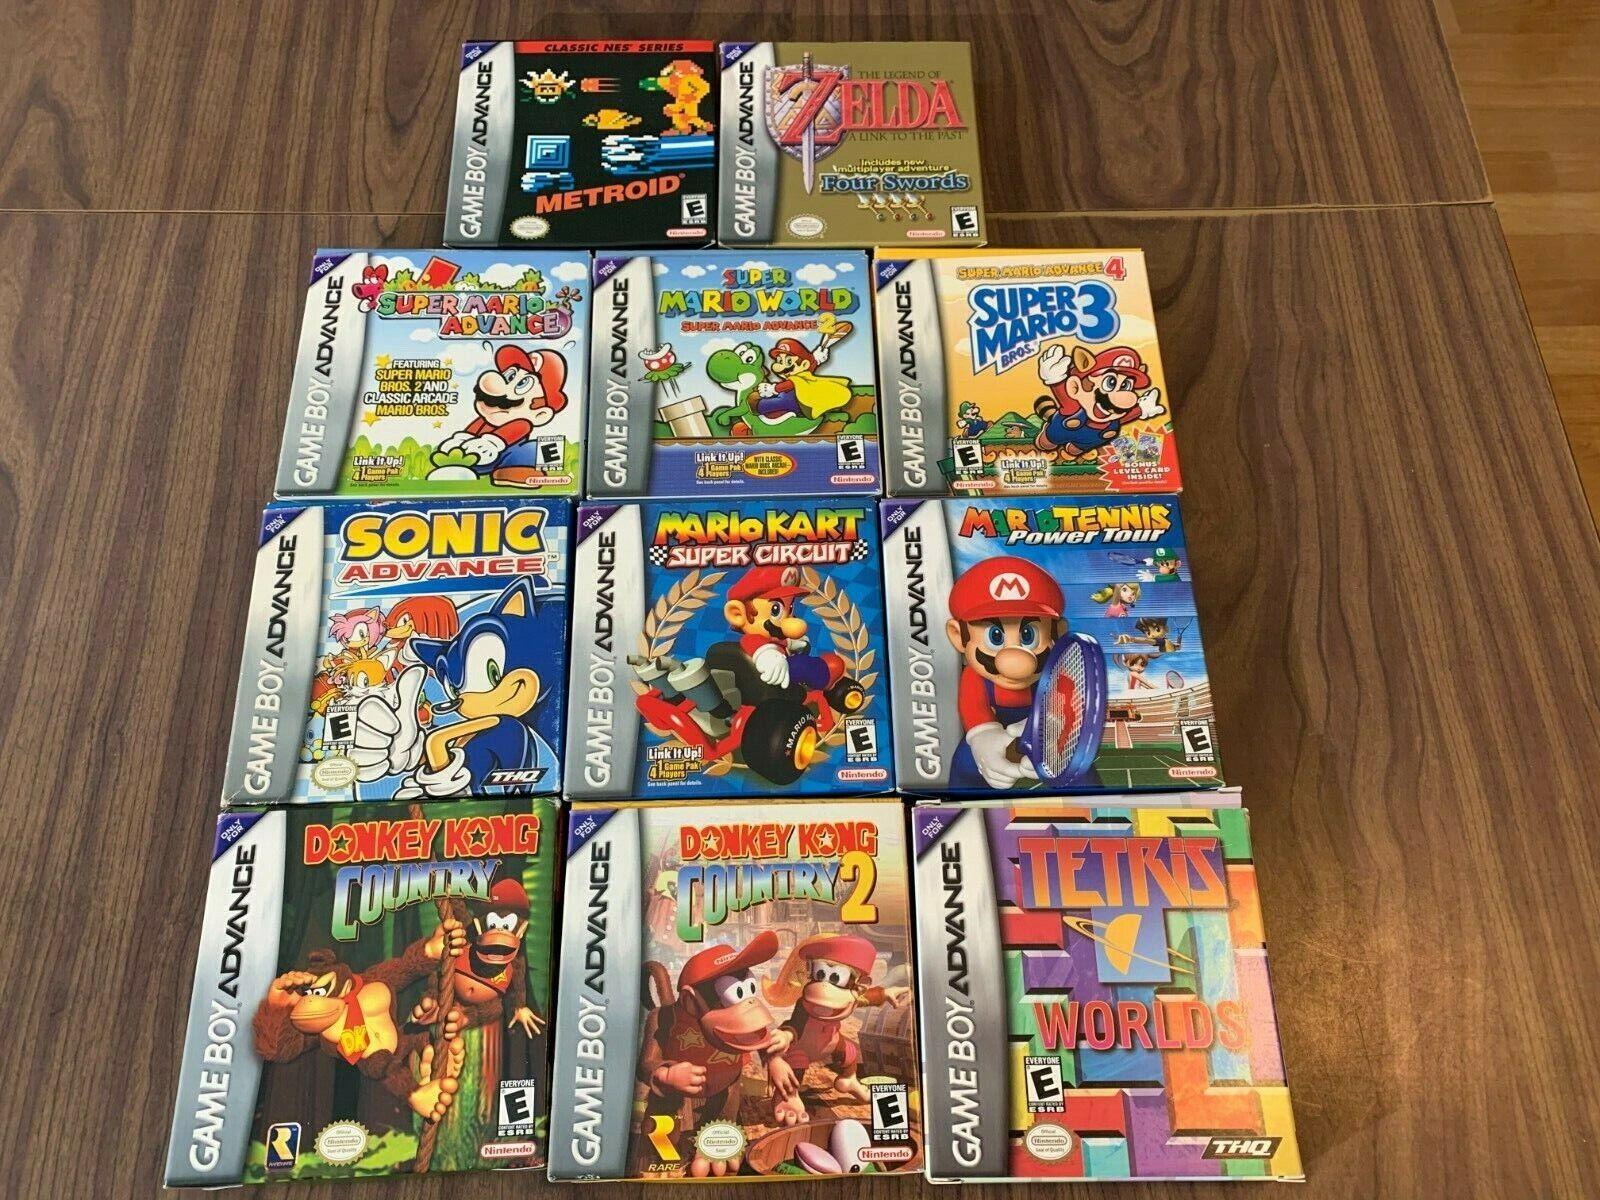 Super Mario Advance 1 2 4 Kart Donkey Kong Country Tennis GameBoy Advance, GBA  - $499.95